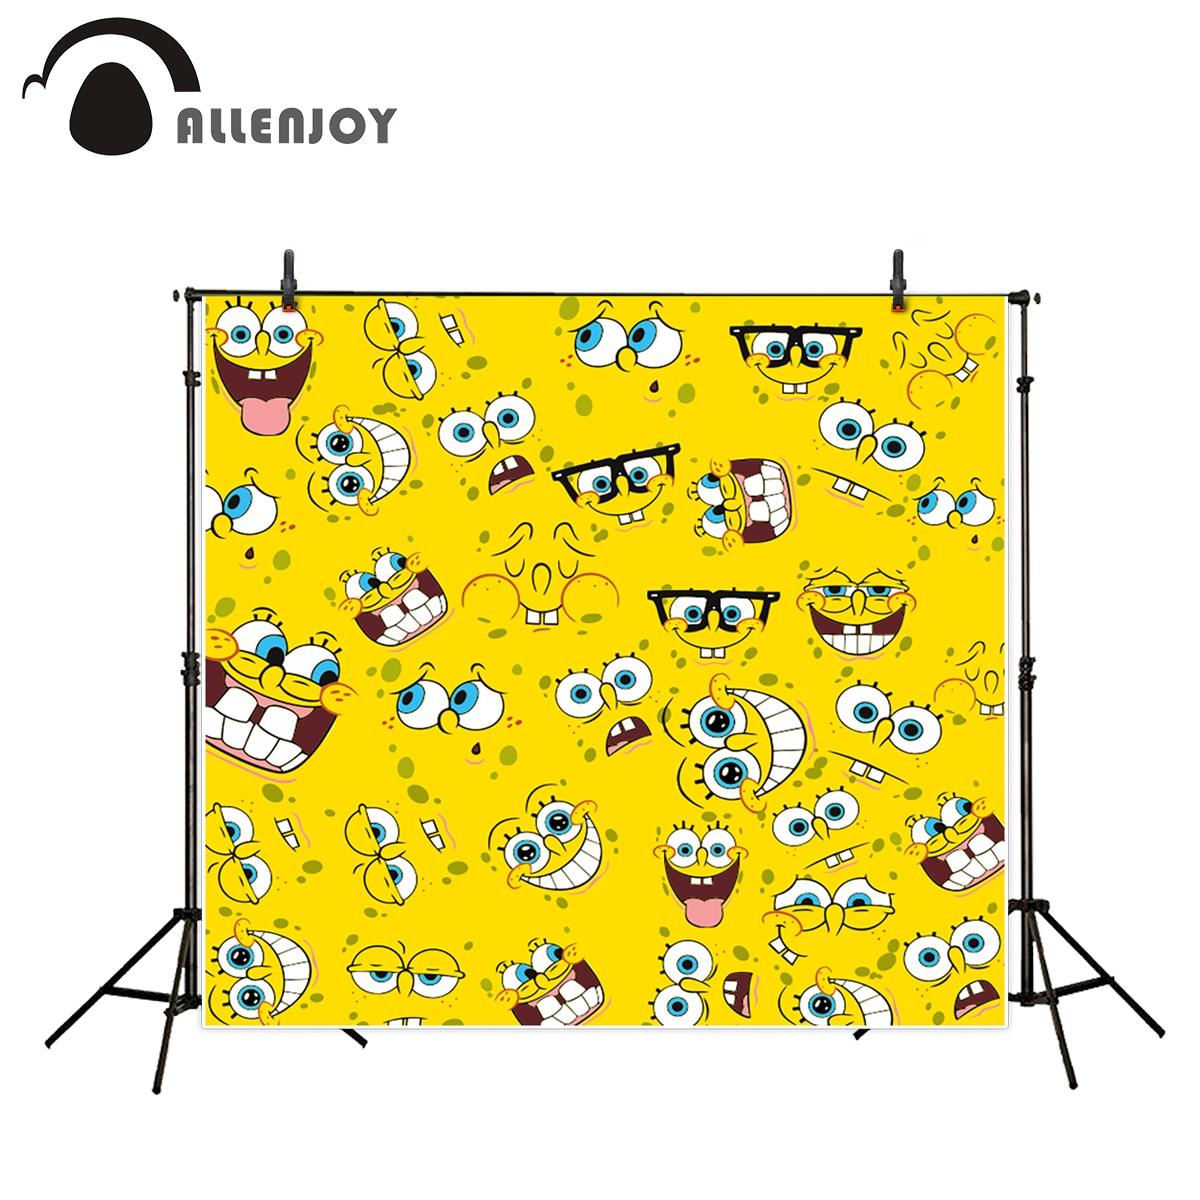 93 Gambar Gambar Kartun Lucu Warna Kuning Kekinian